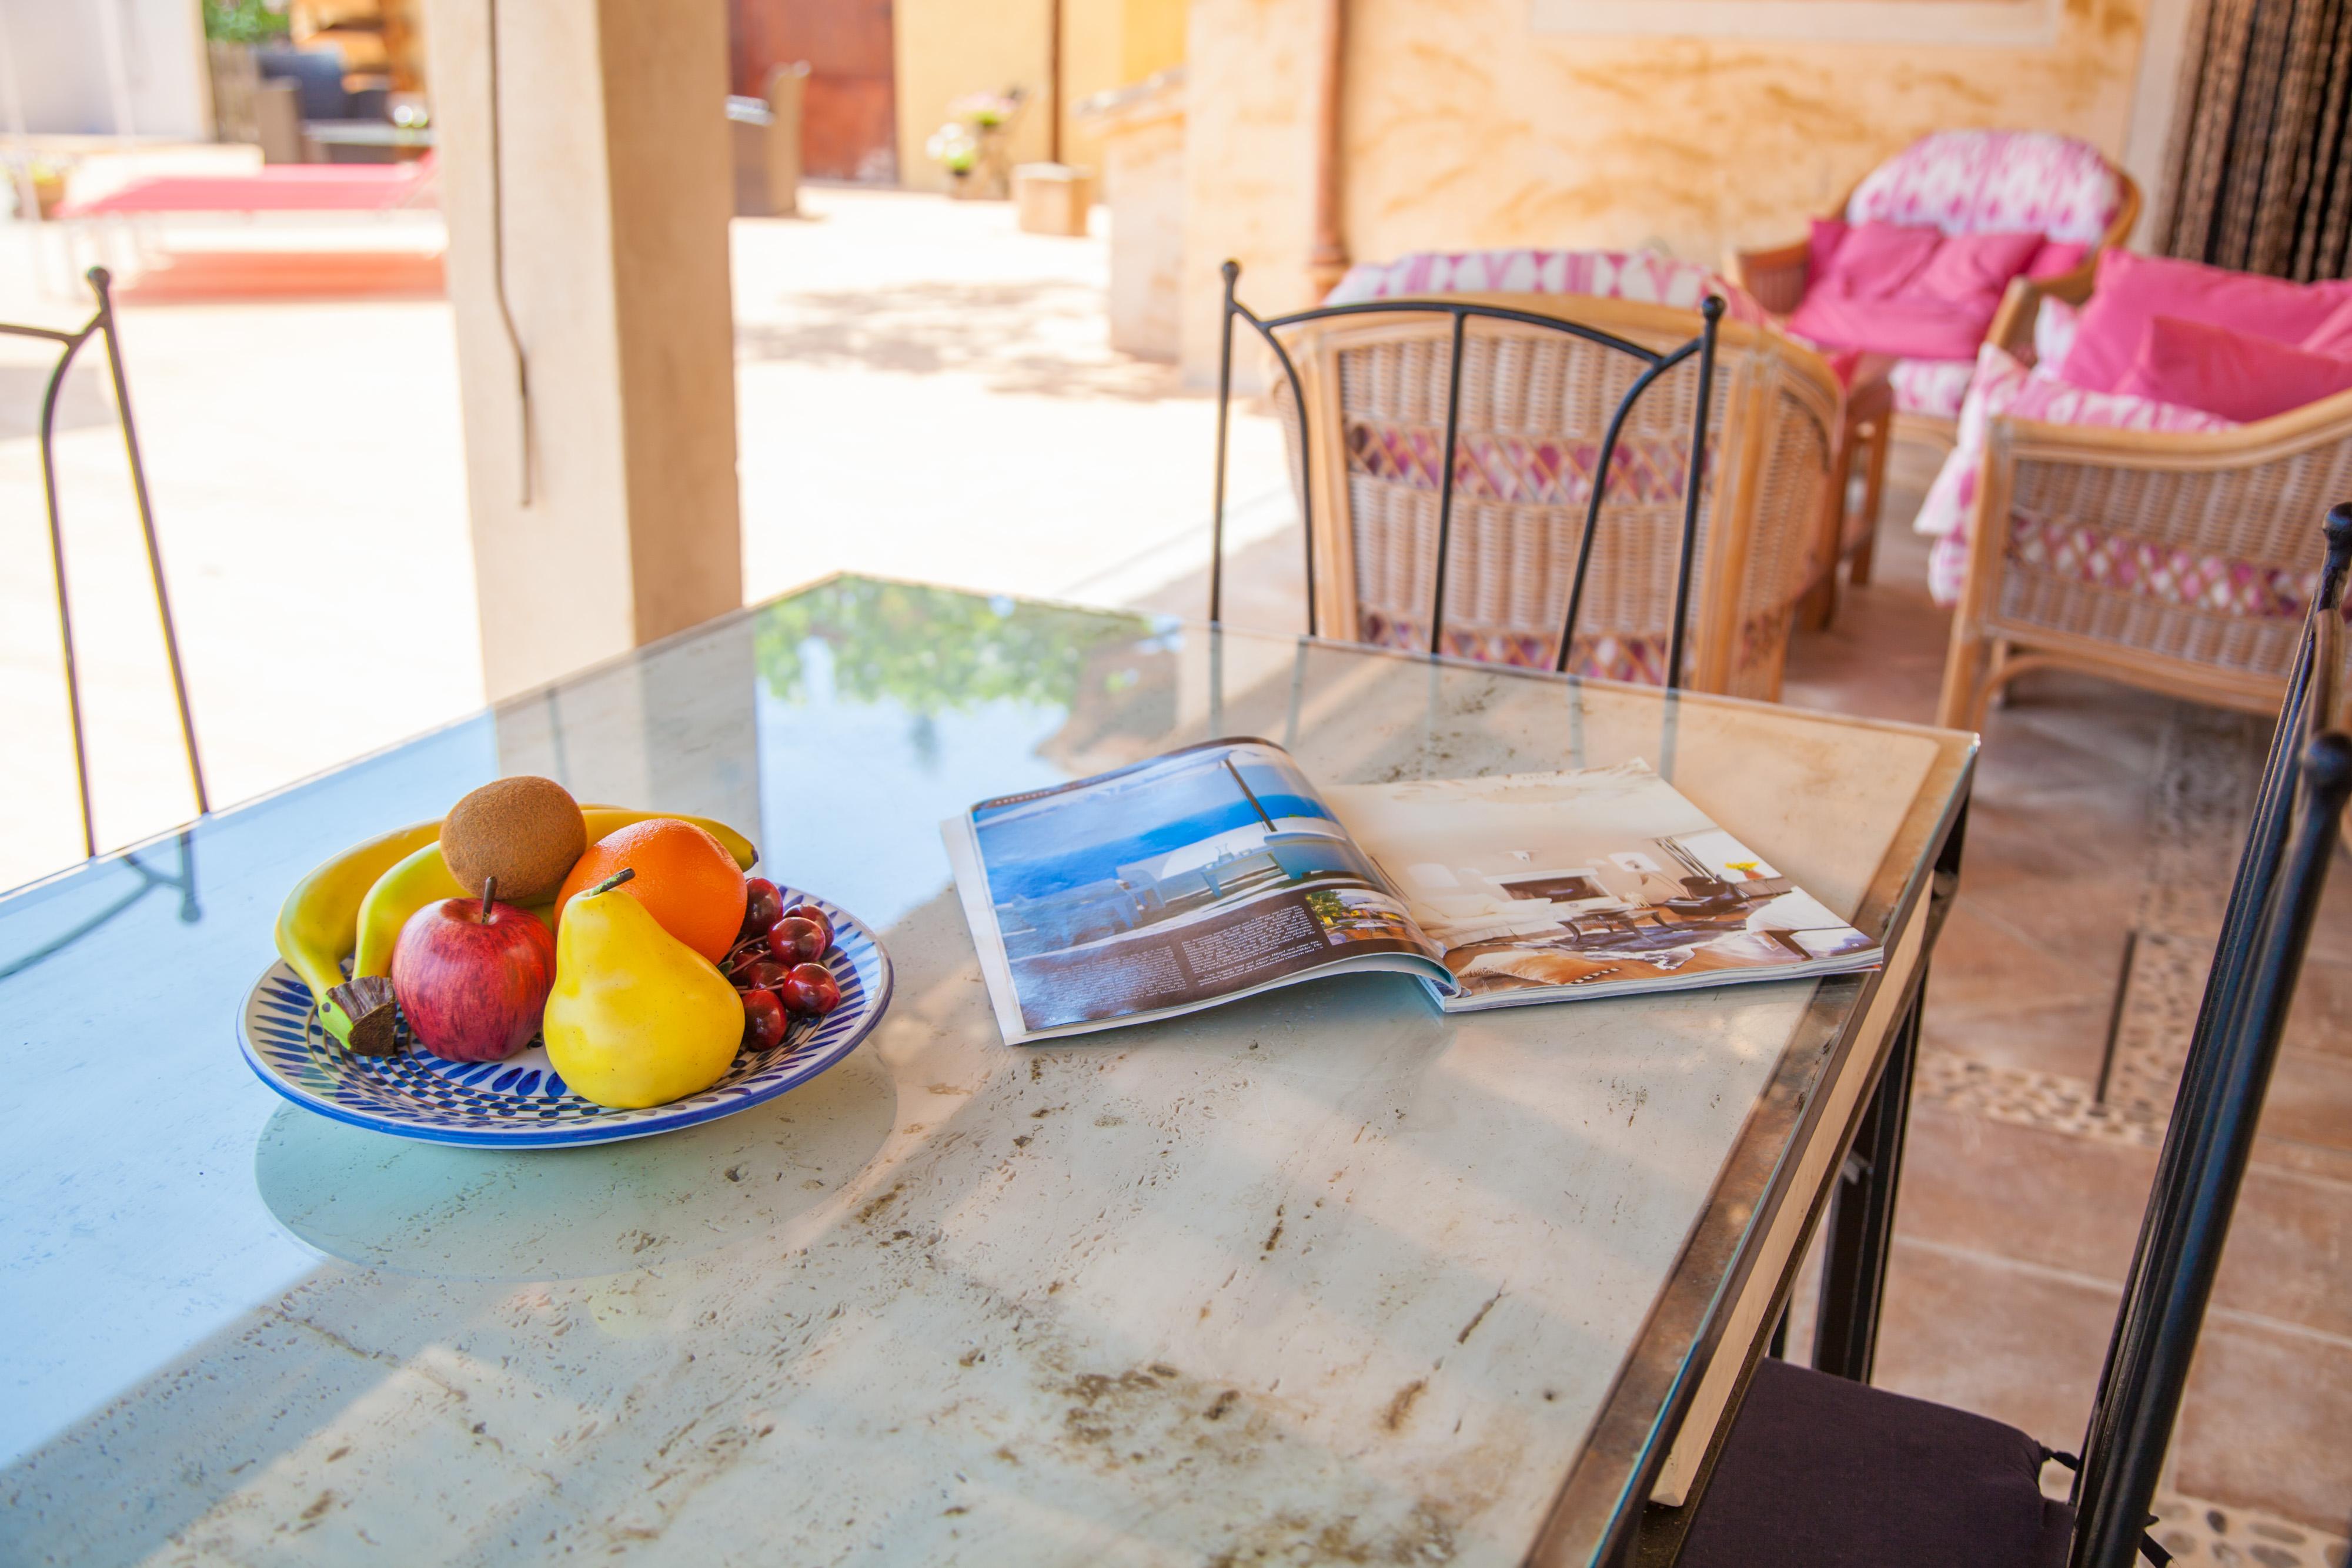 Ferienhaus SA CORBAIA (2020559), Arta, Mallorca, Balearische Inseln, Spanien, Bild 12